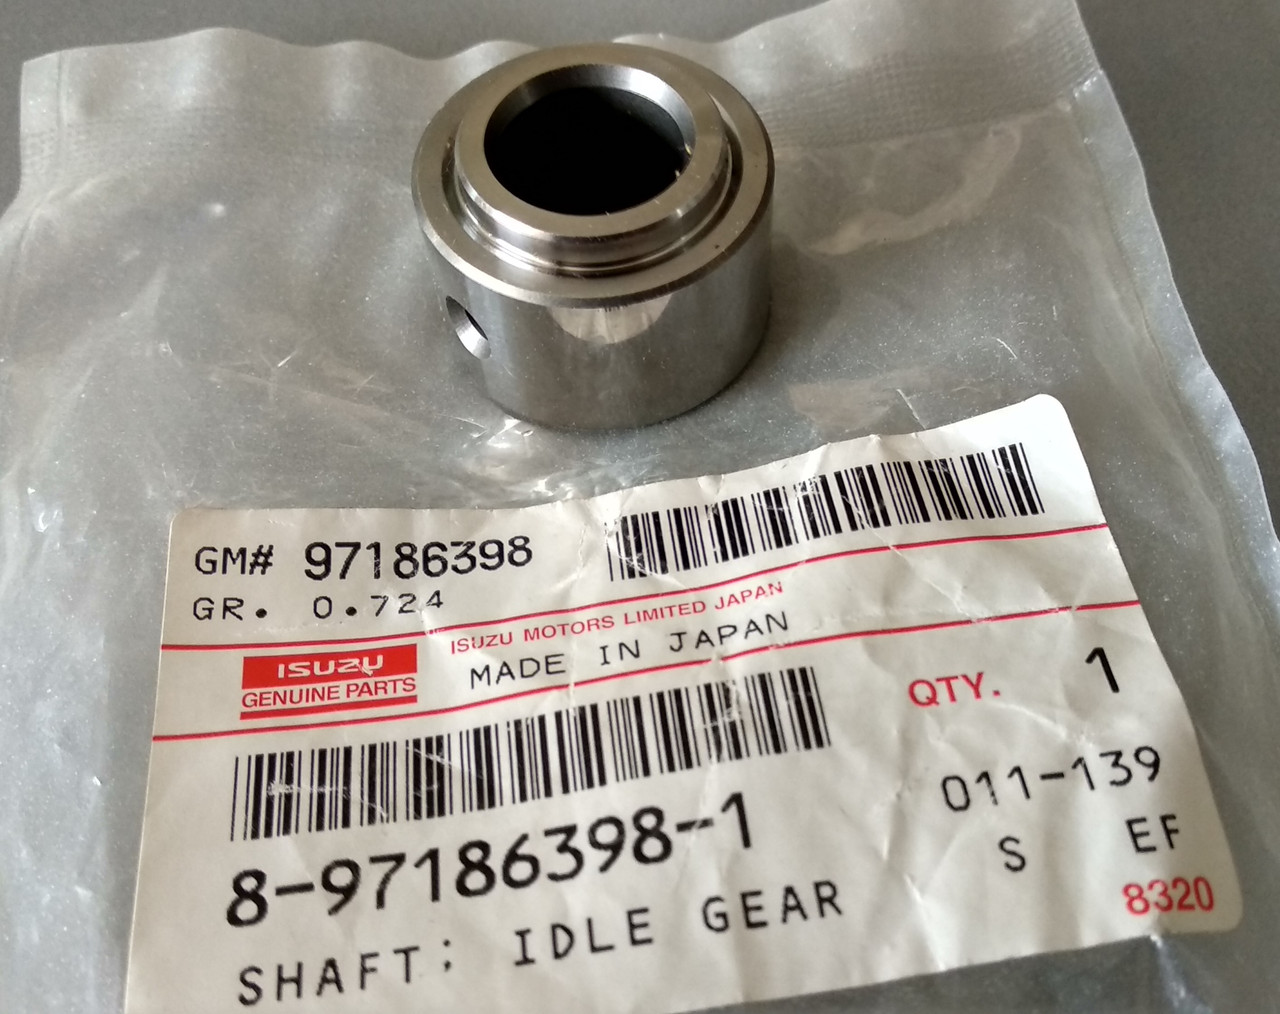 Втулка шестерни ГРМ двигателя Isuzu 8971863981